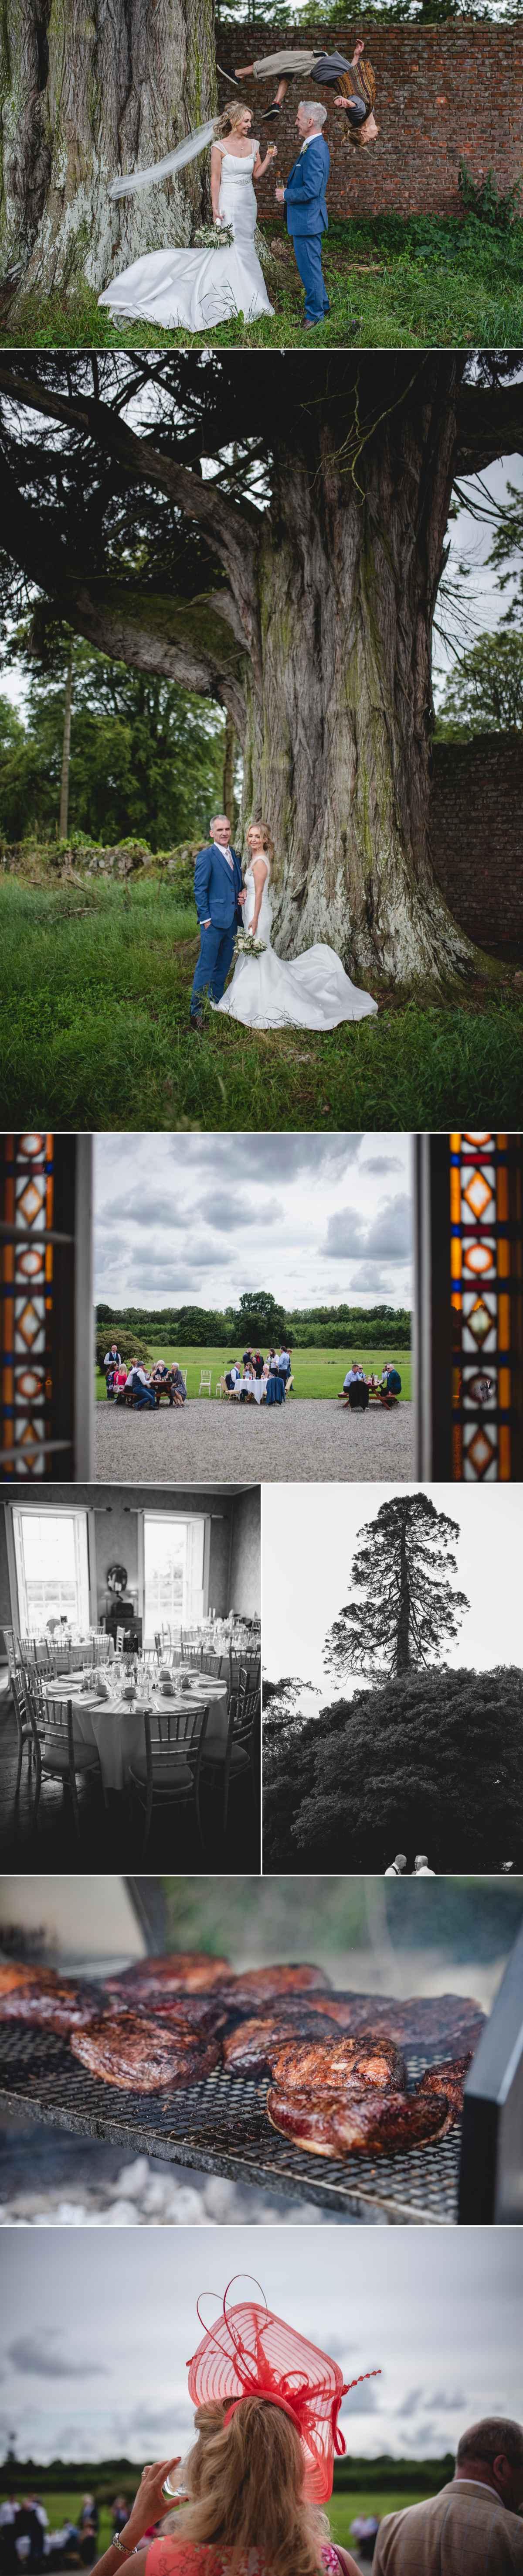 Rustic Wedding Ireland Photographer 13.jpg